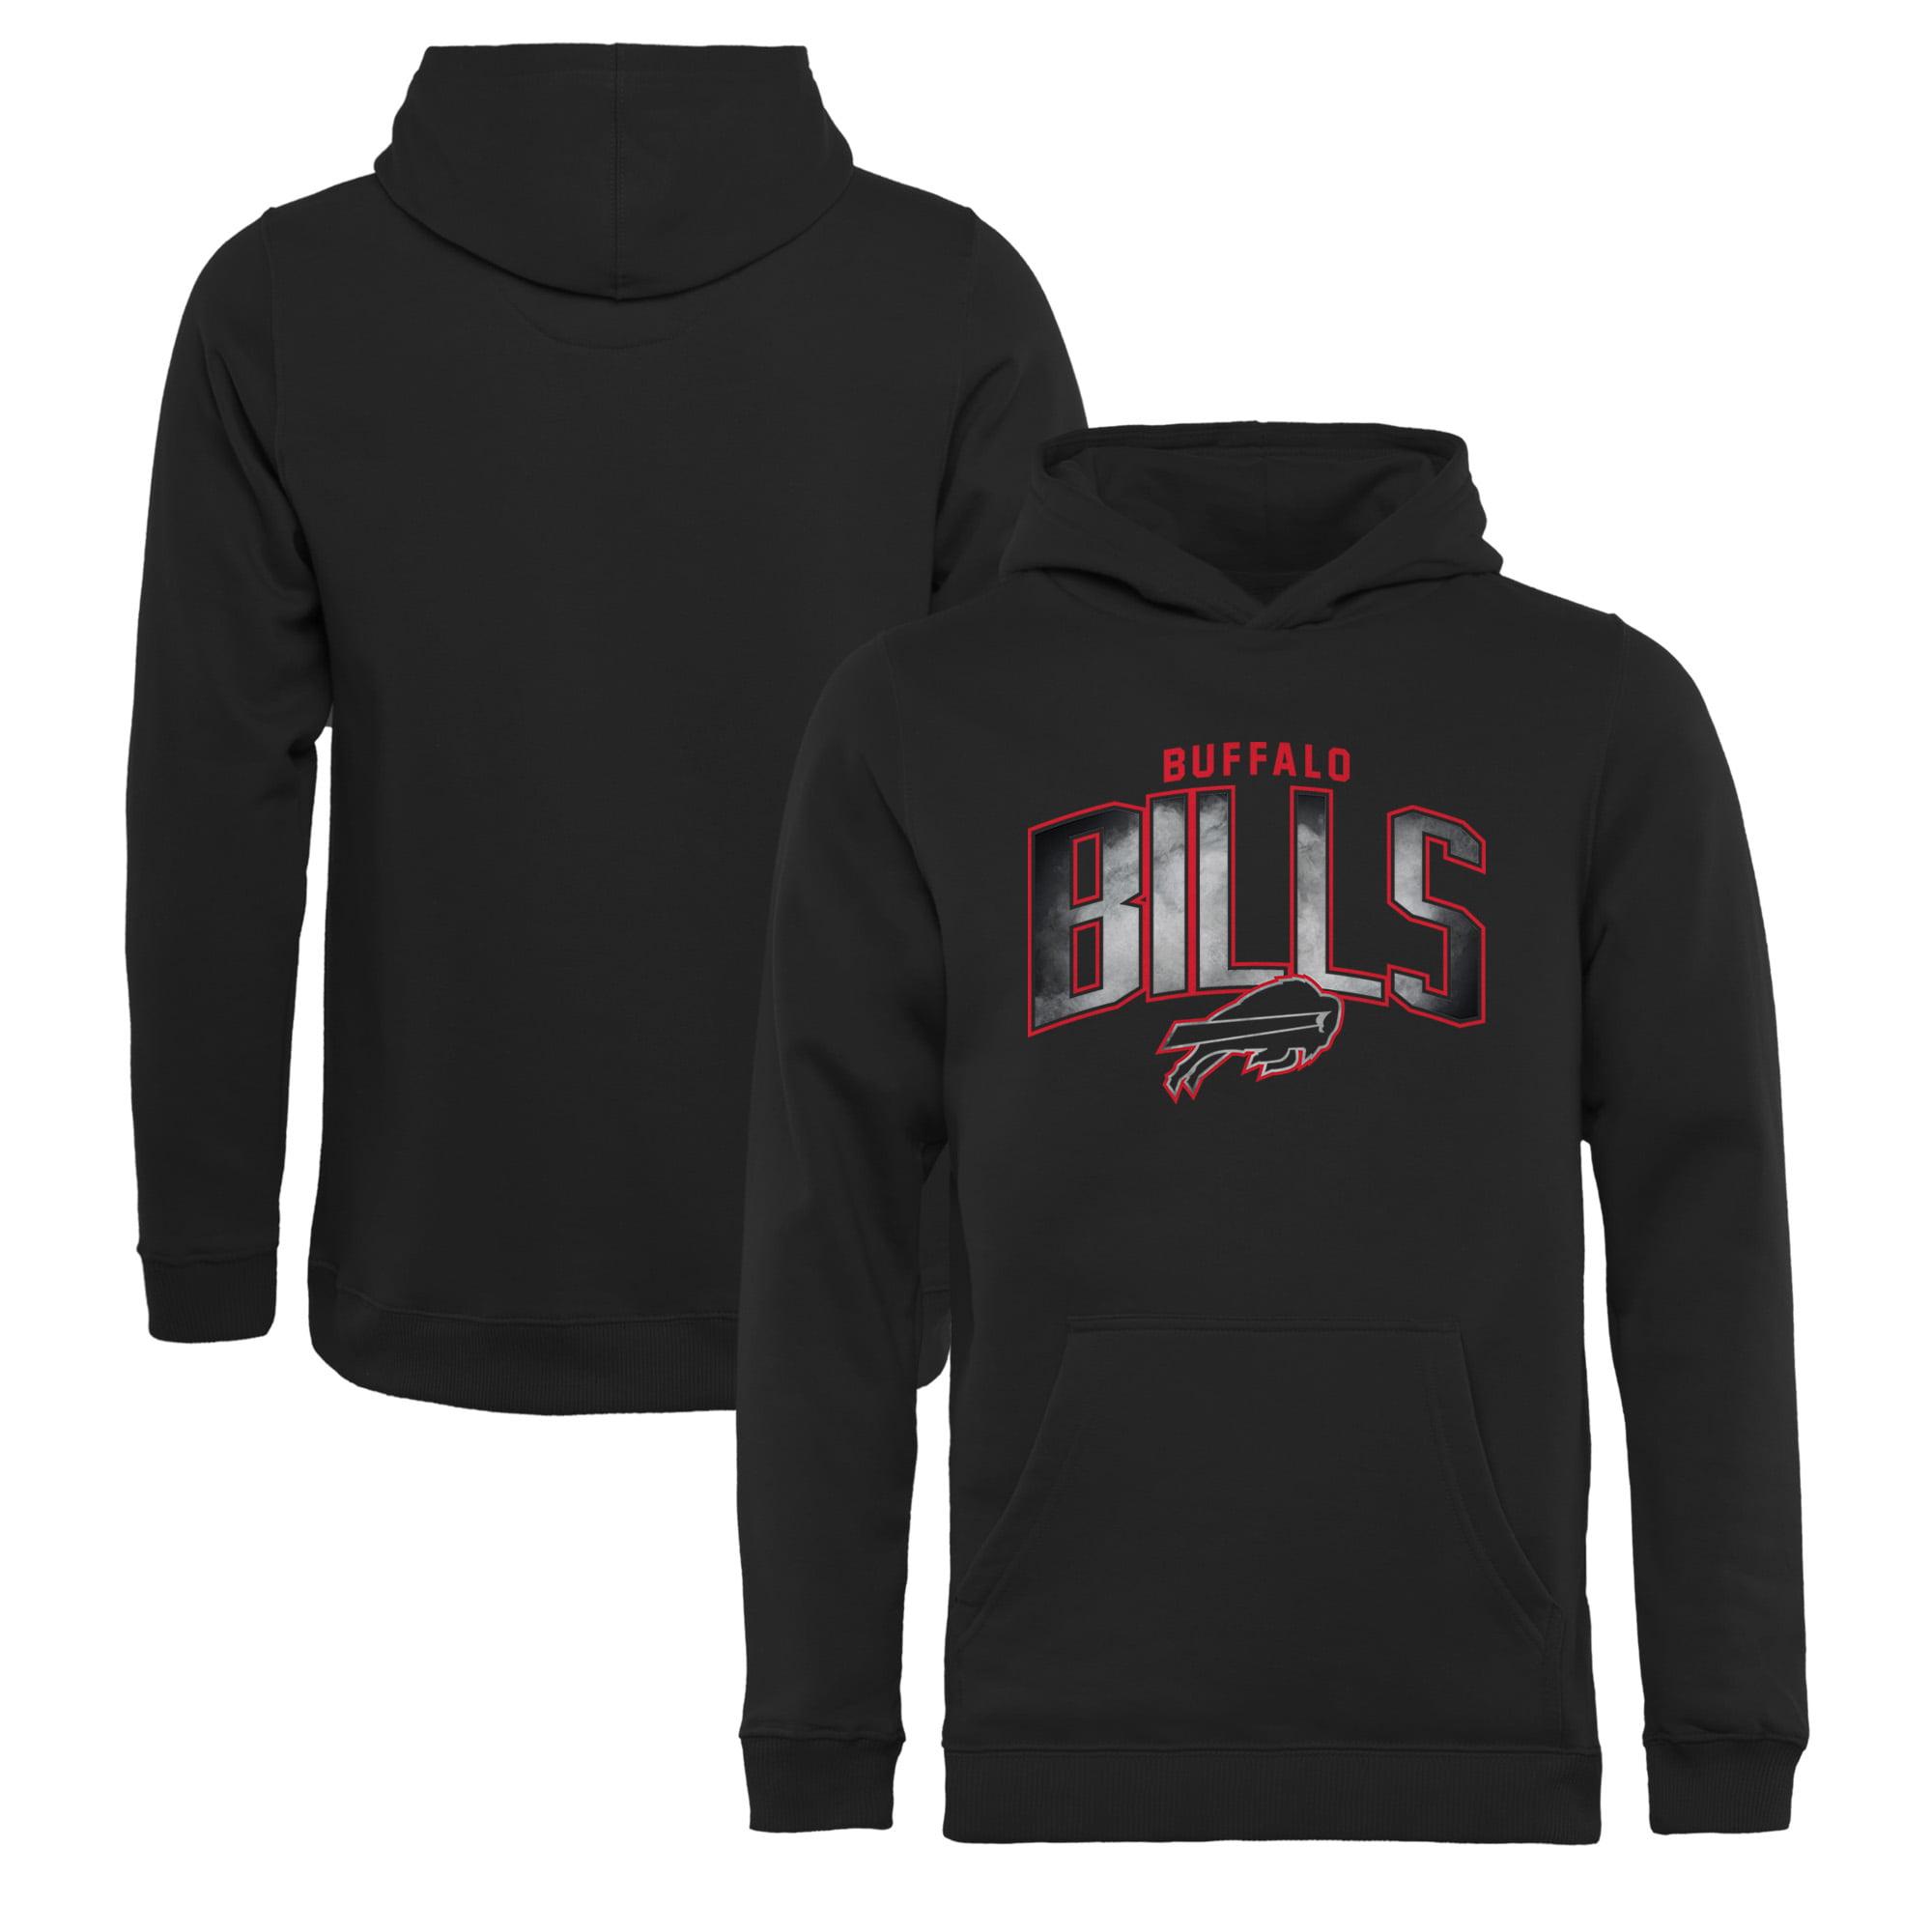 Buffalo Bills NFL Pro Line by Fanatics Branded Youth Arch Smoke Pullover Hoodie - Black